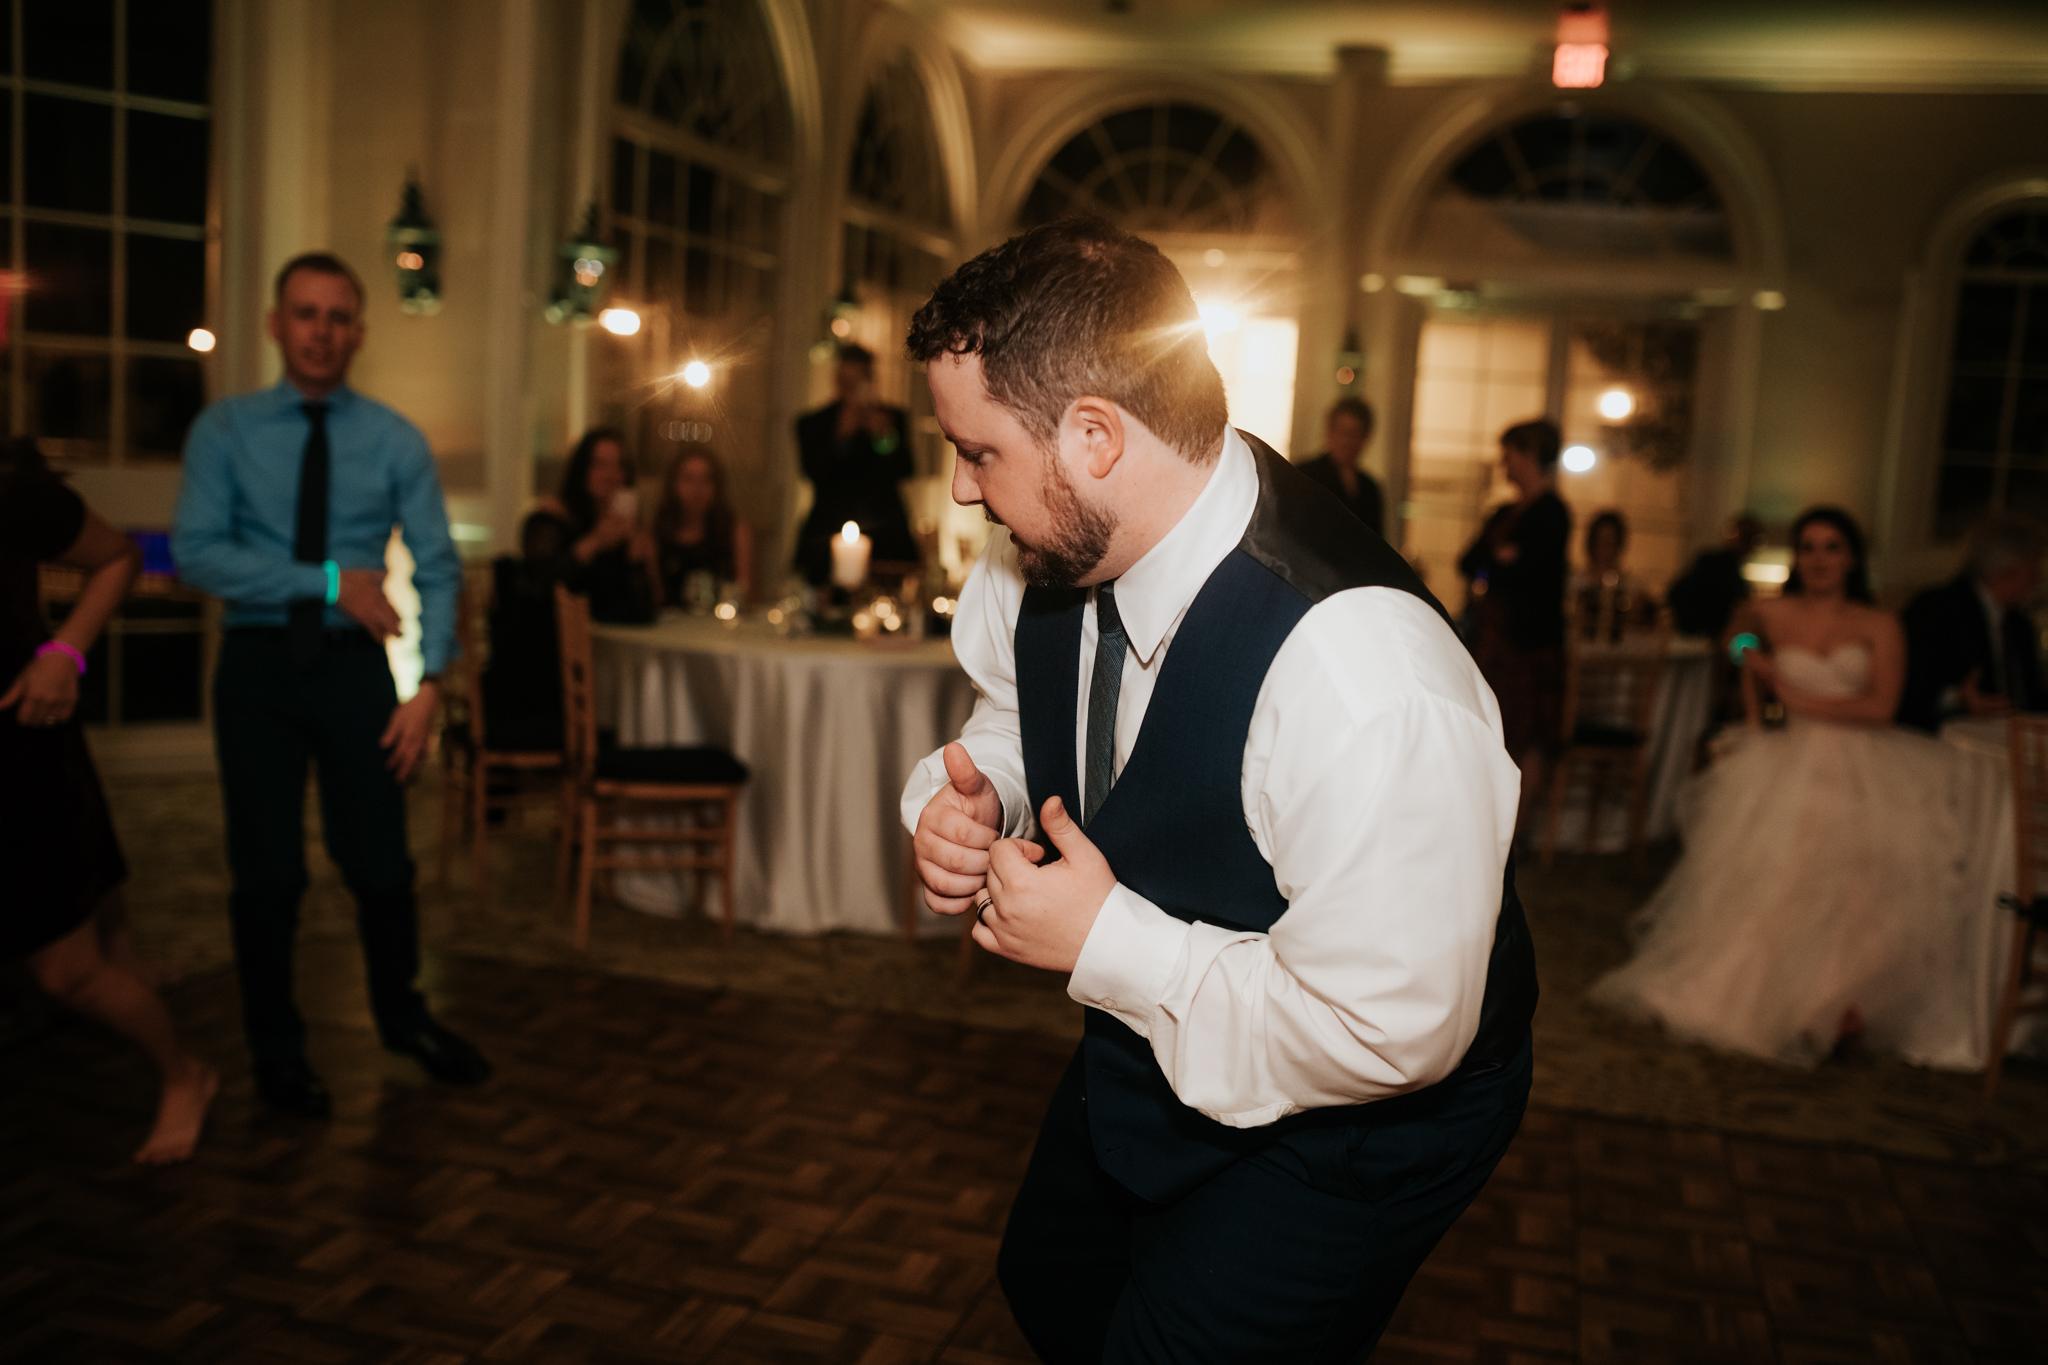 Leah Nicole Photography - Houston Wedding Photographer-Lake Conroe Wedding- Houston Wedding Photographer-52.jpg